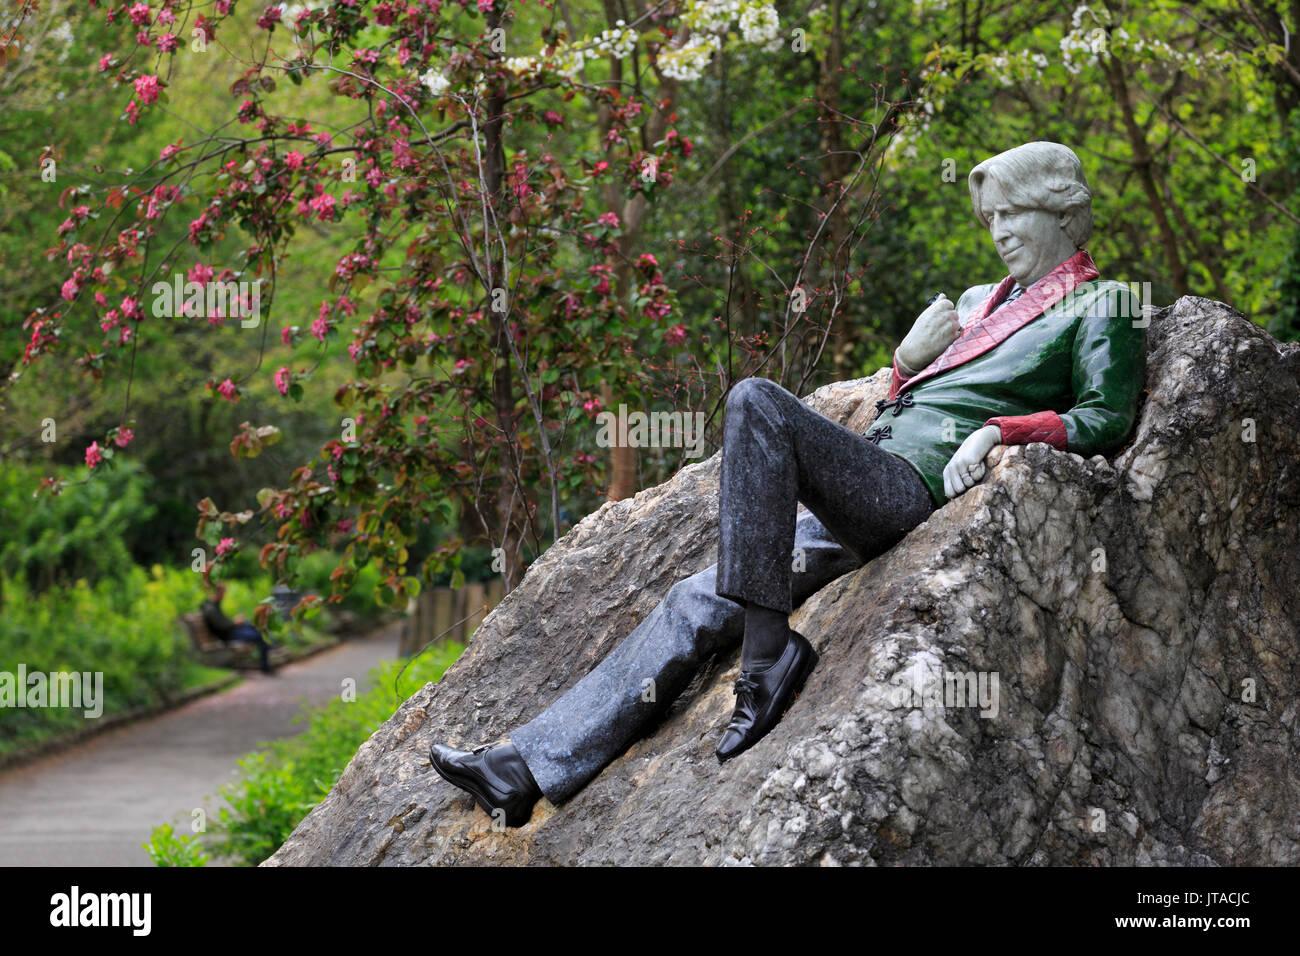 Oscar Wilde Sculpture, Merrion Square, Dublin City, County Dublin, Republic of Ireland, Europe - Stock Image